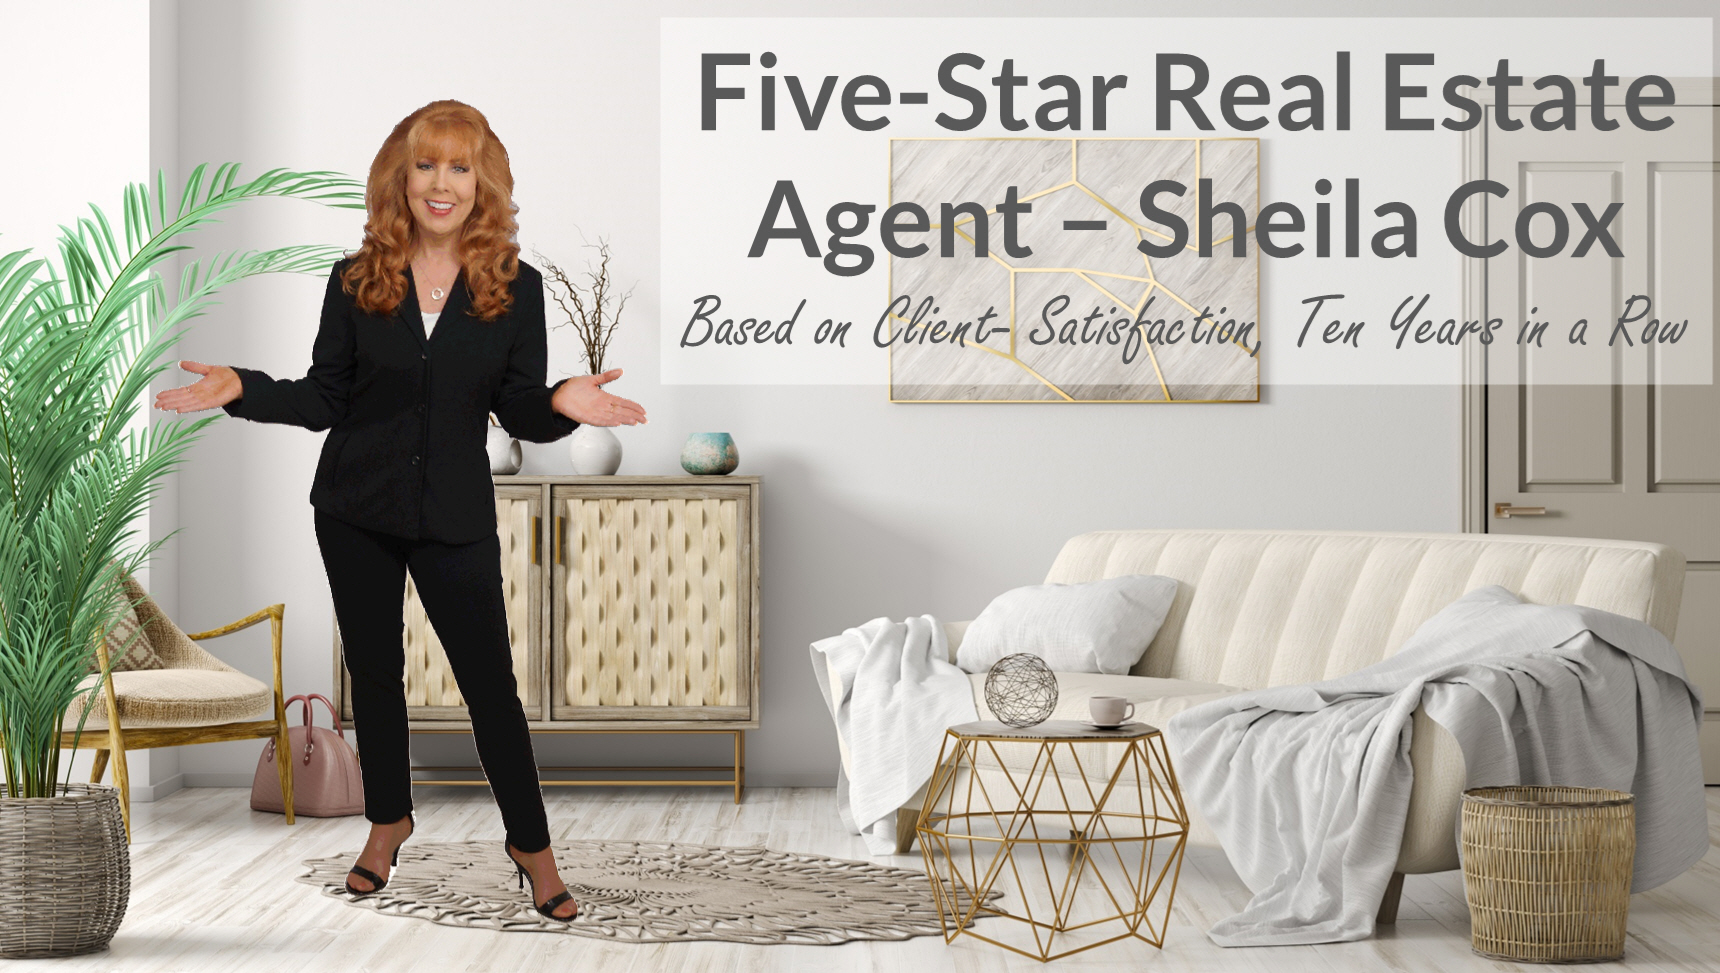 sheila cox five star real estate agent